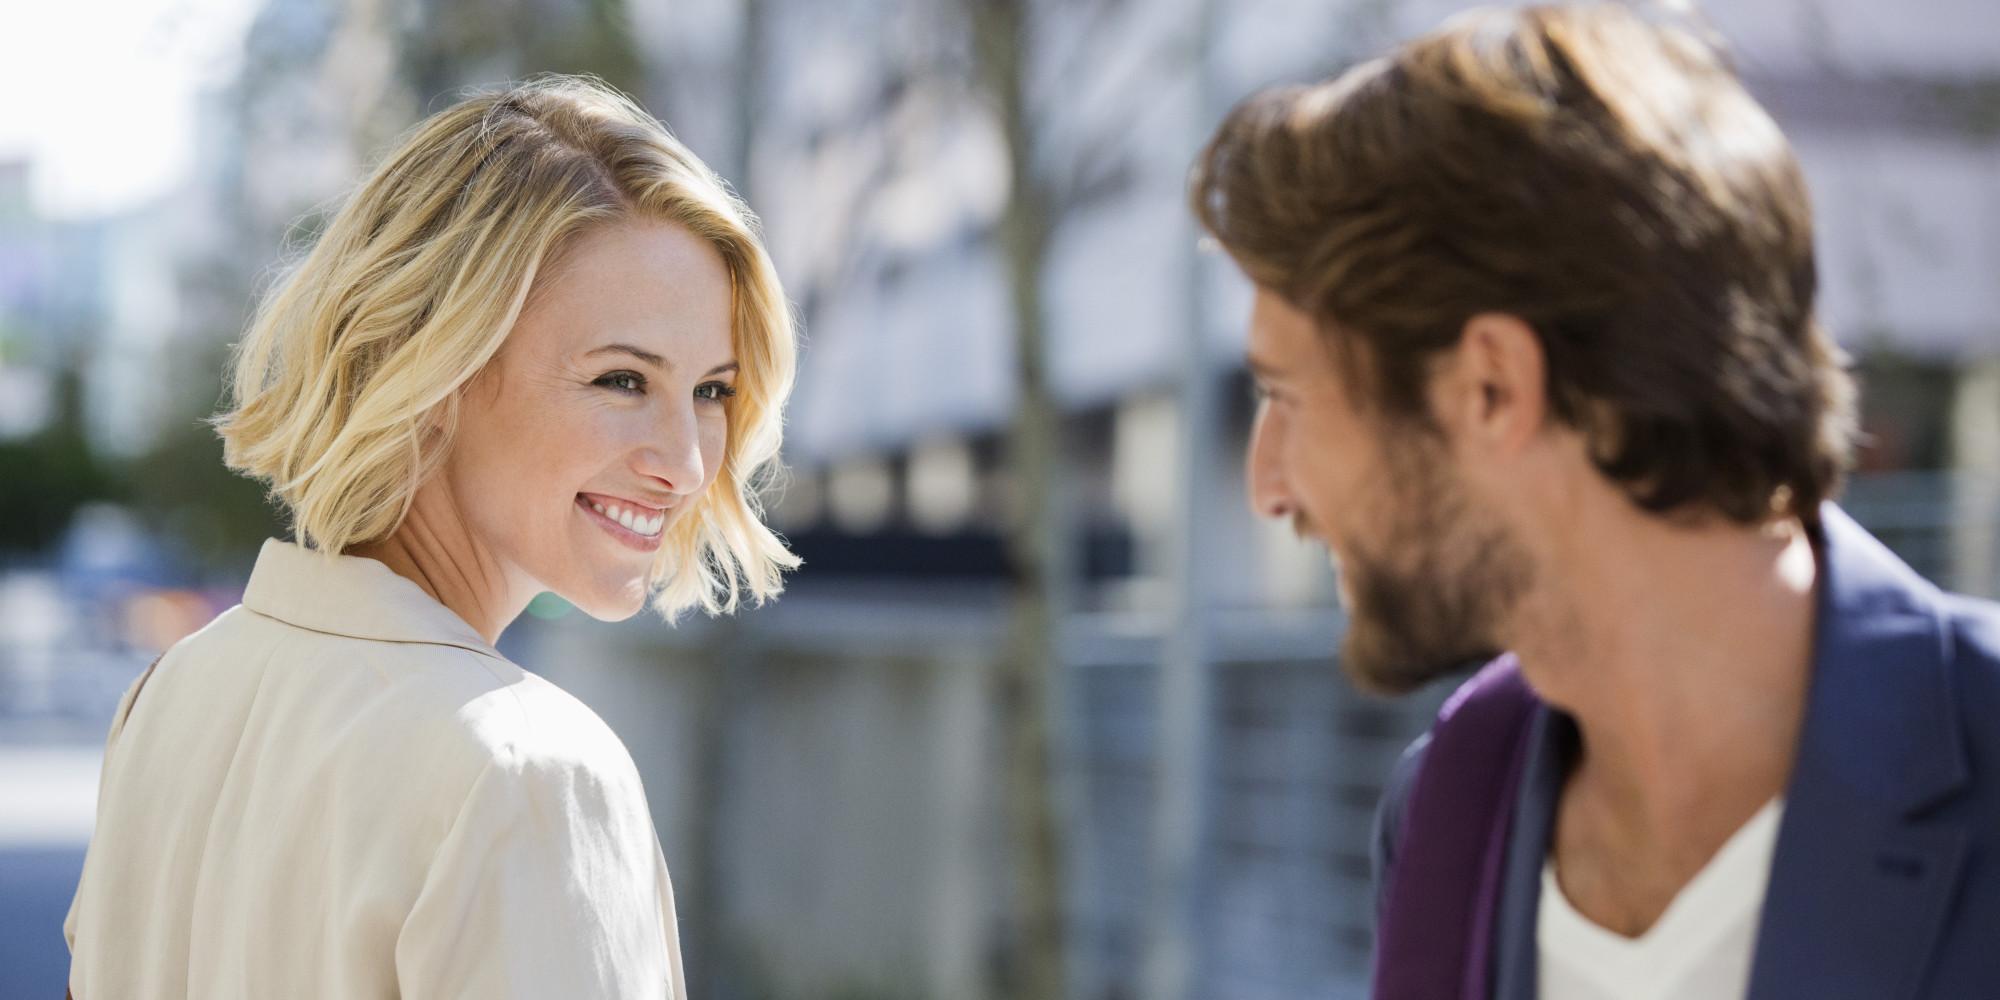 flirting moves that work for men images 2017 images for women